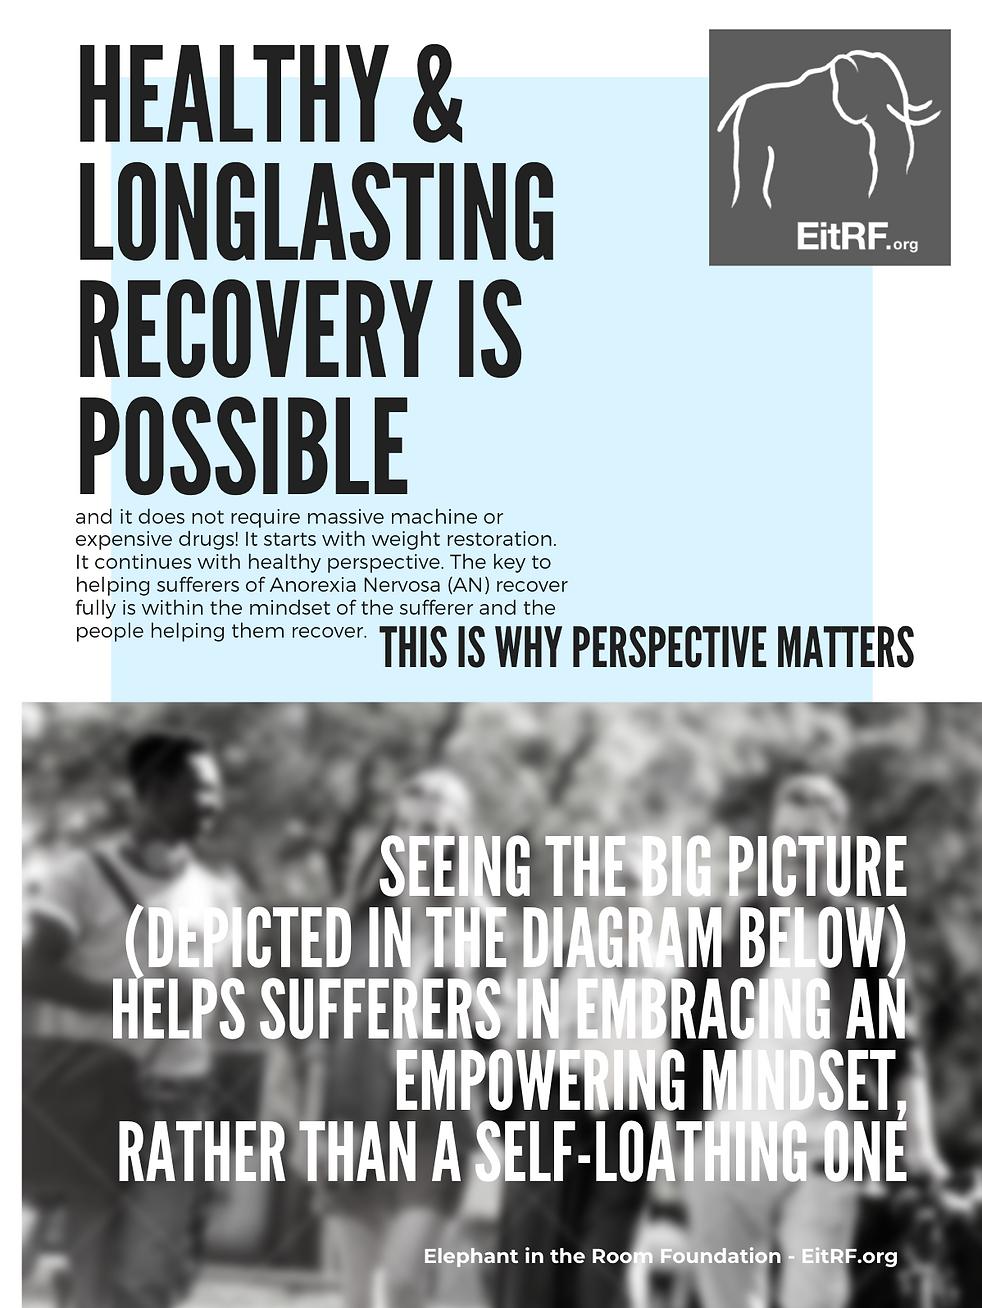 PerspectiveMattersDiagram.png